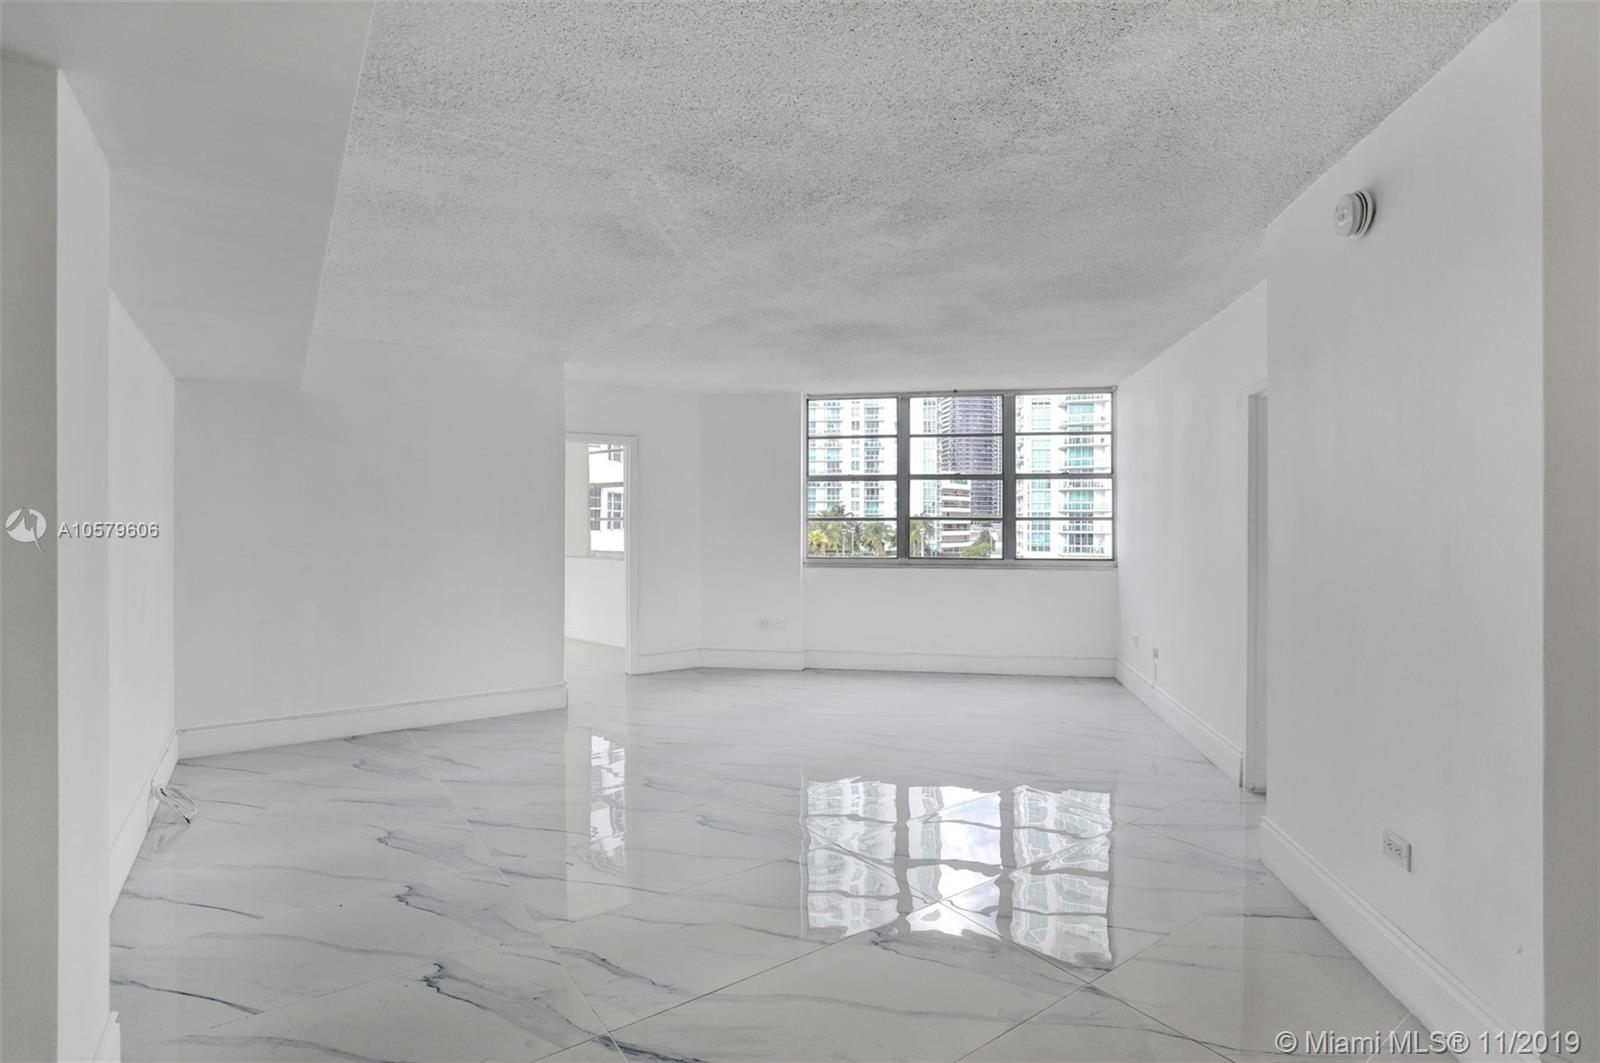 905 Brickell Bay Drive, Miami, FL 33131, Four Ambassadors #1524, Brickell, Miami A10579606 image #15